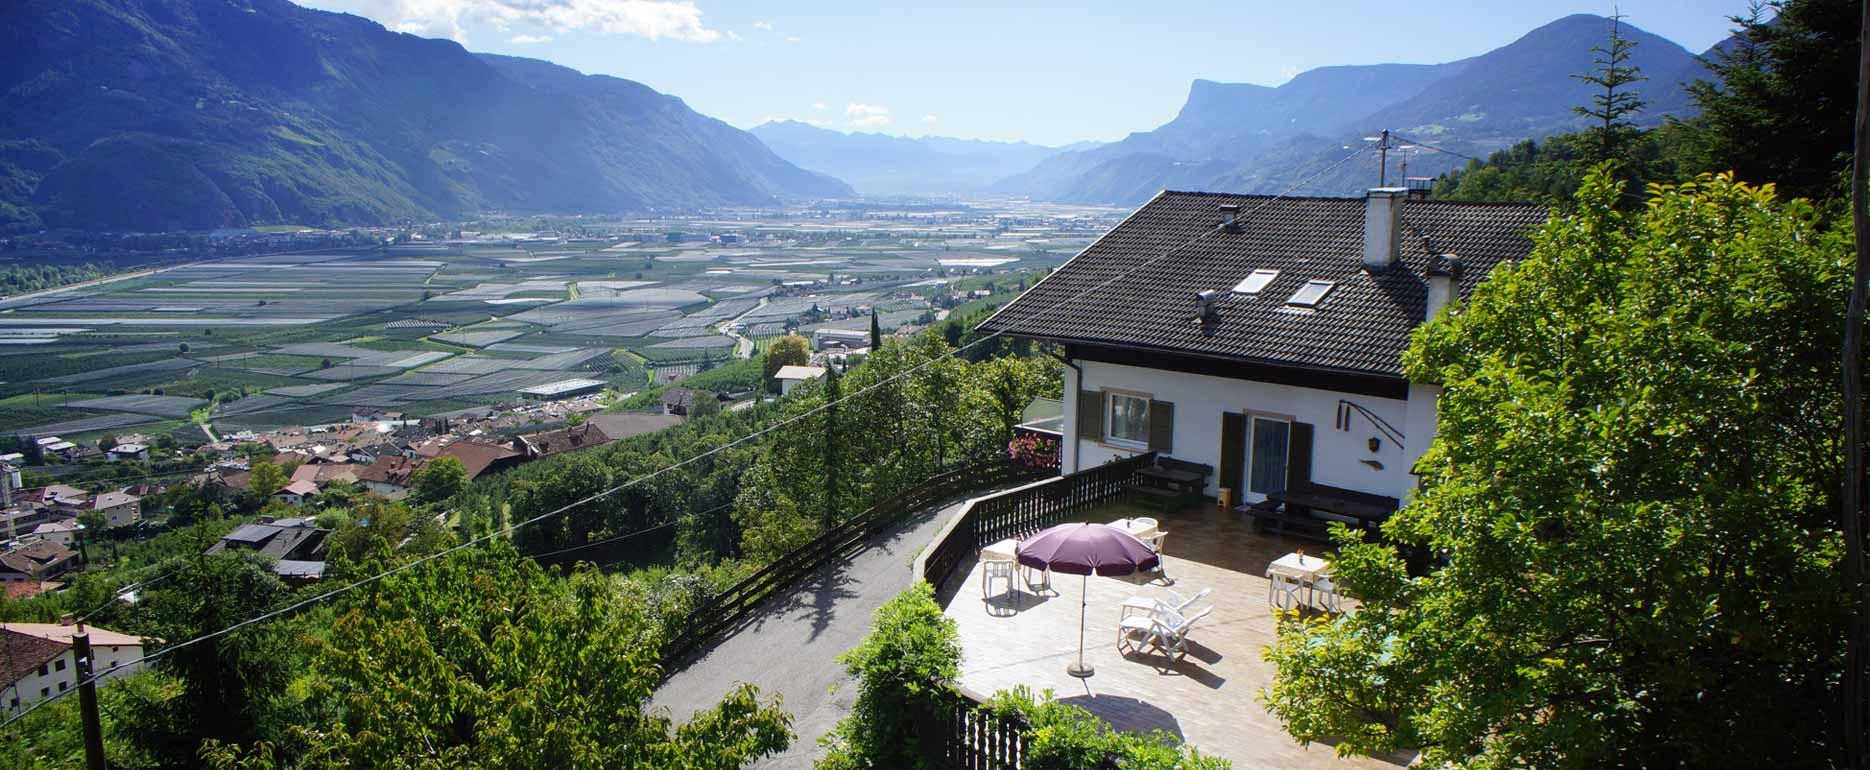 terrazzo panoramico maso Schiessbichler